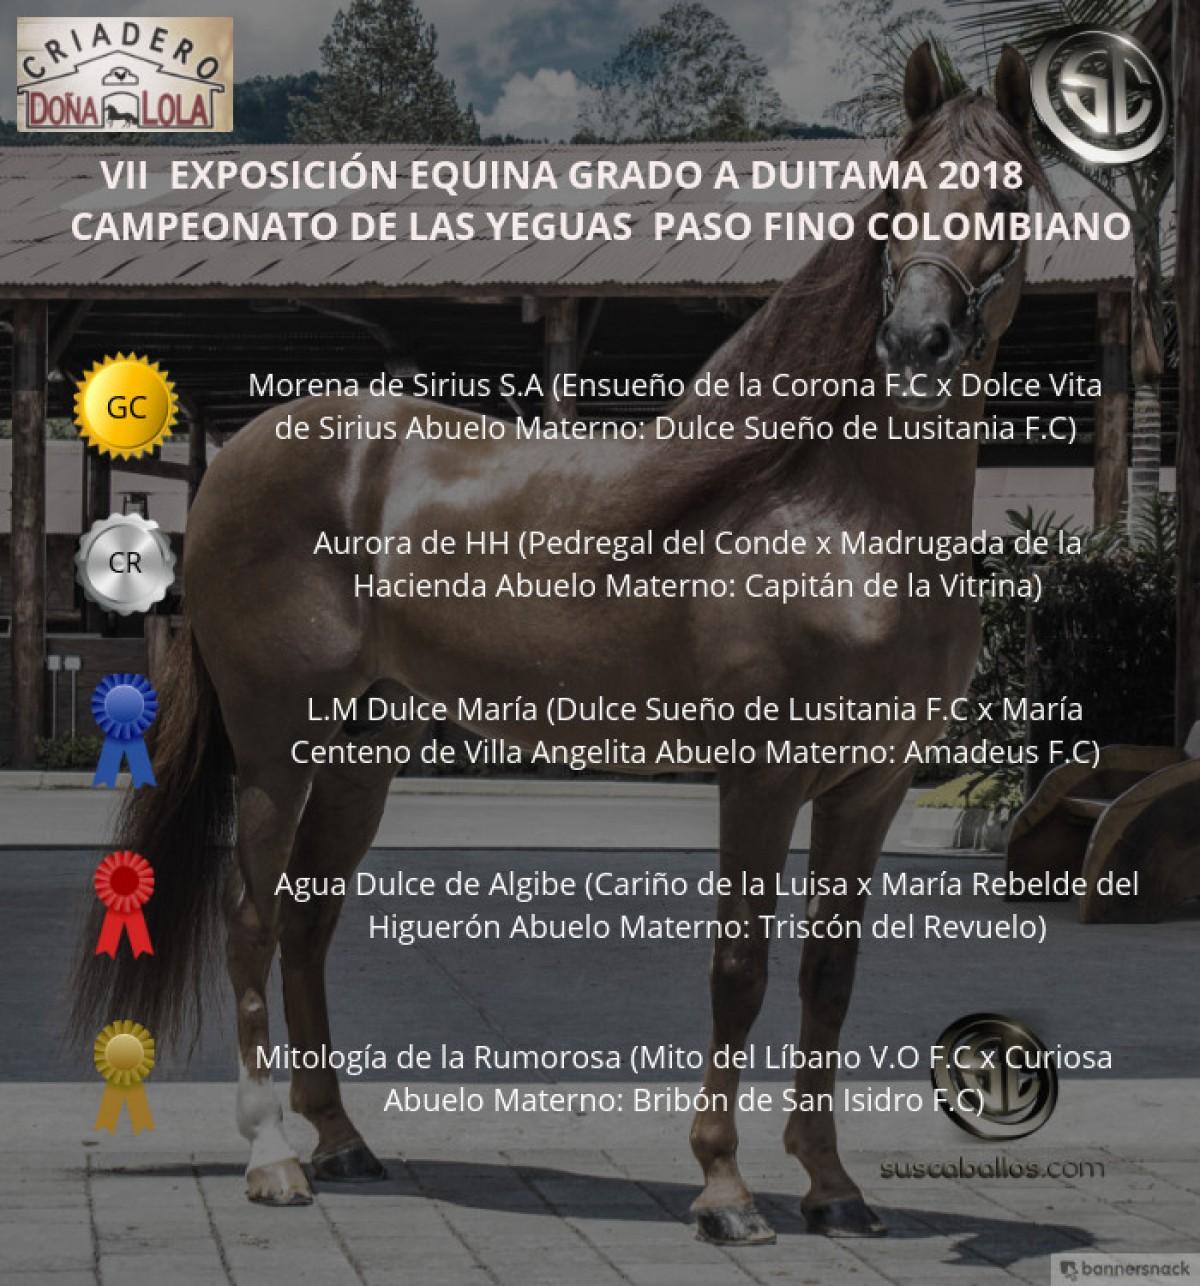 VÍDEO: Morena Campeona, Aurora Reservada, Paso Fino Colombiano, Duitama 2018